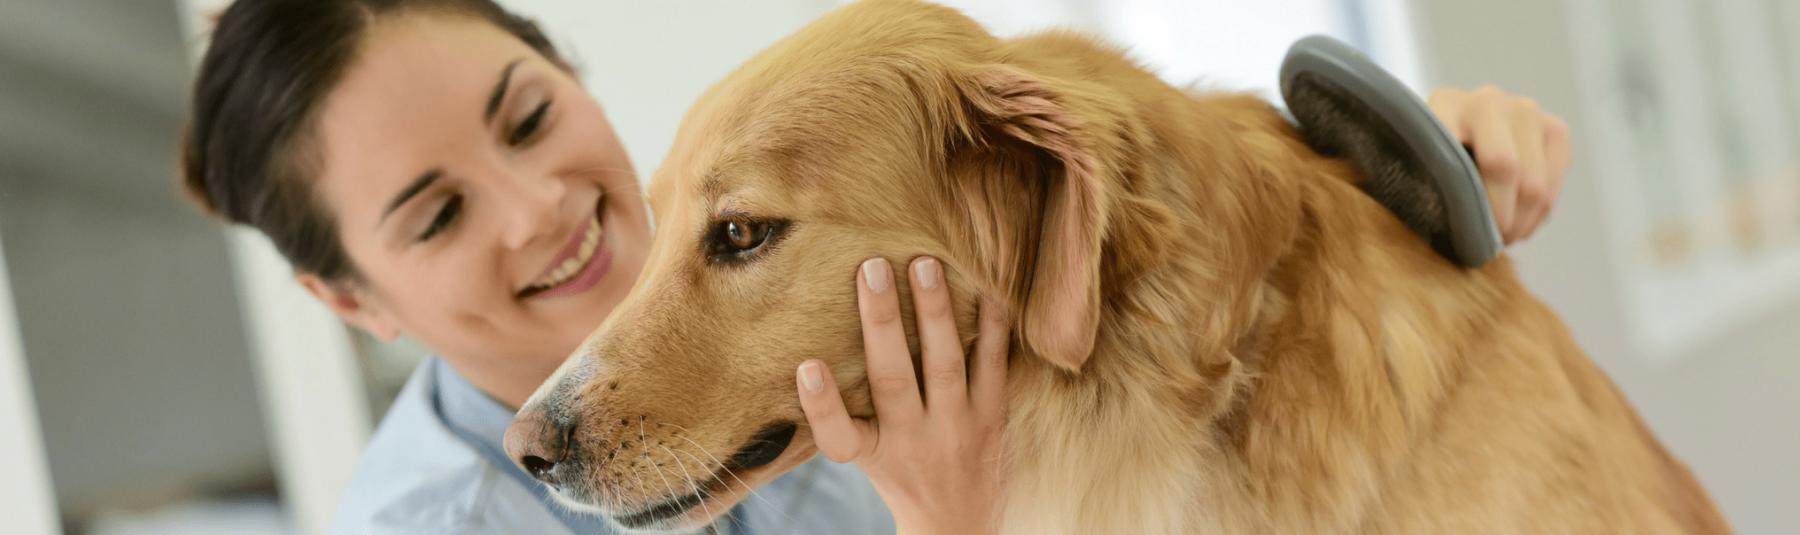 Veterinarian brushing a dog